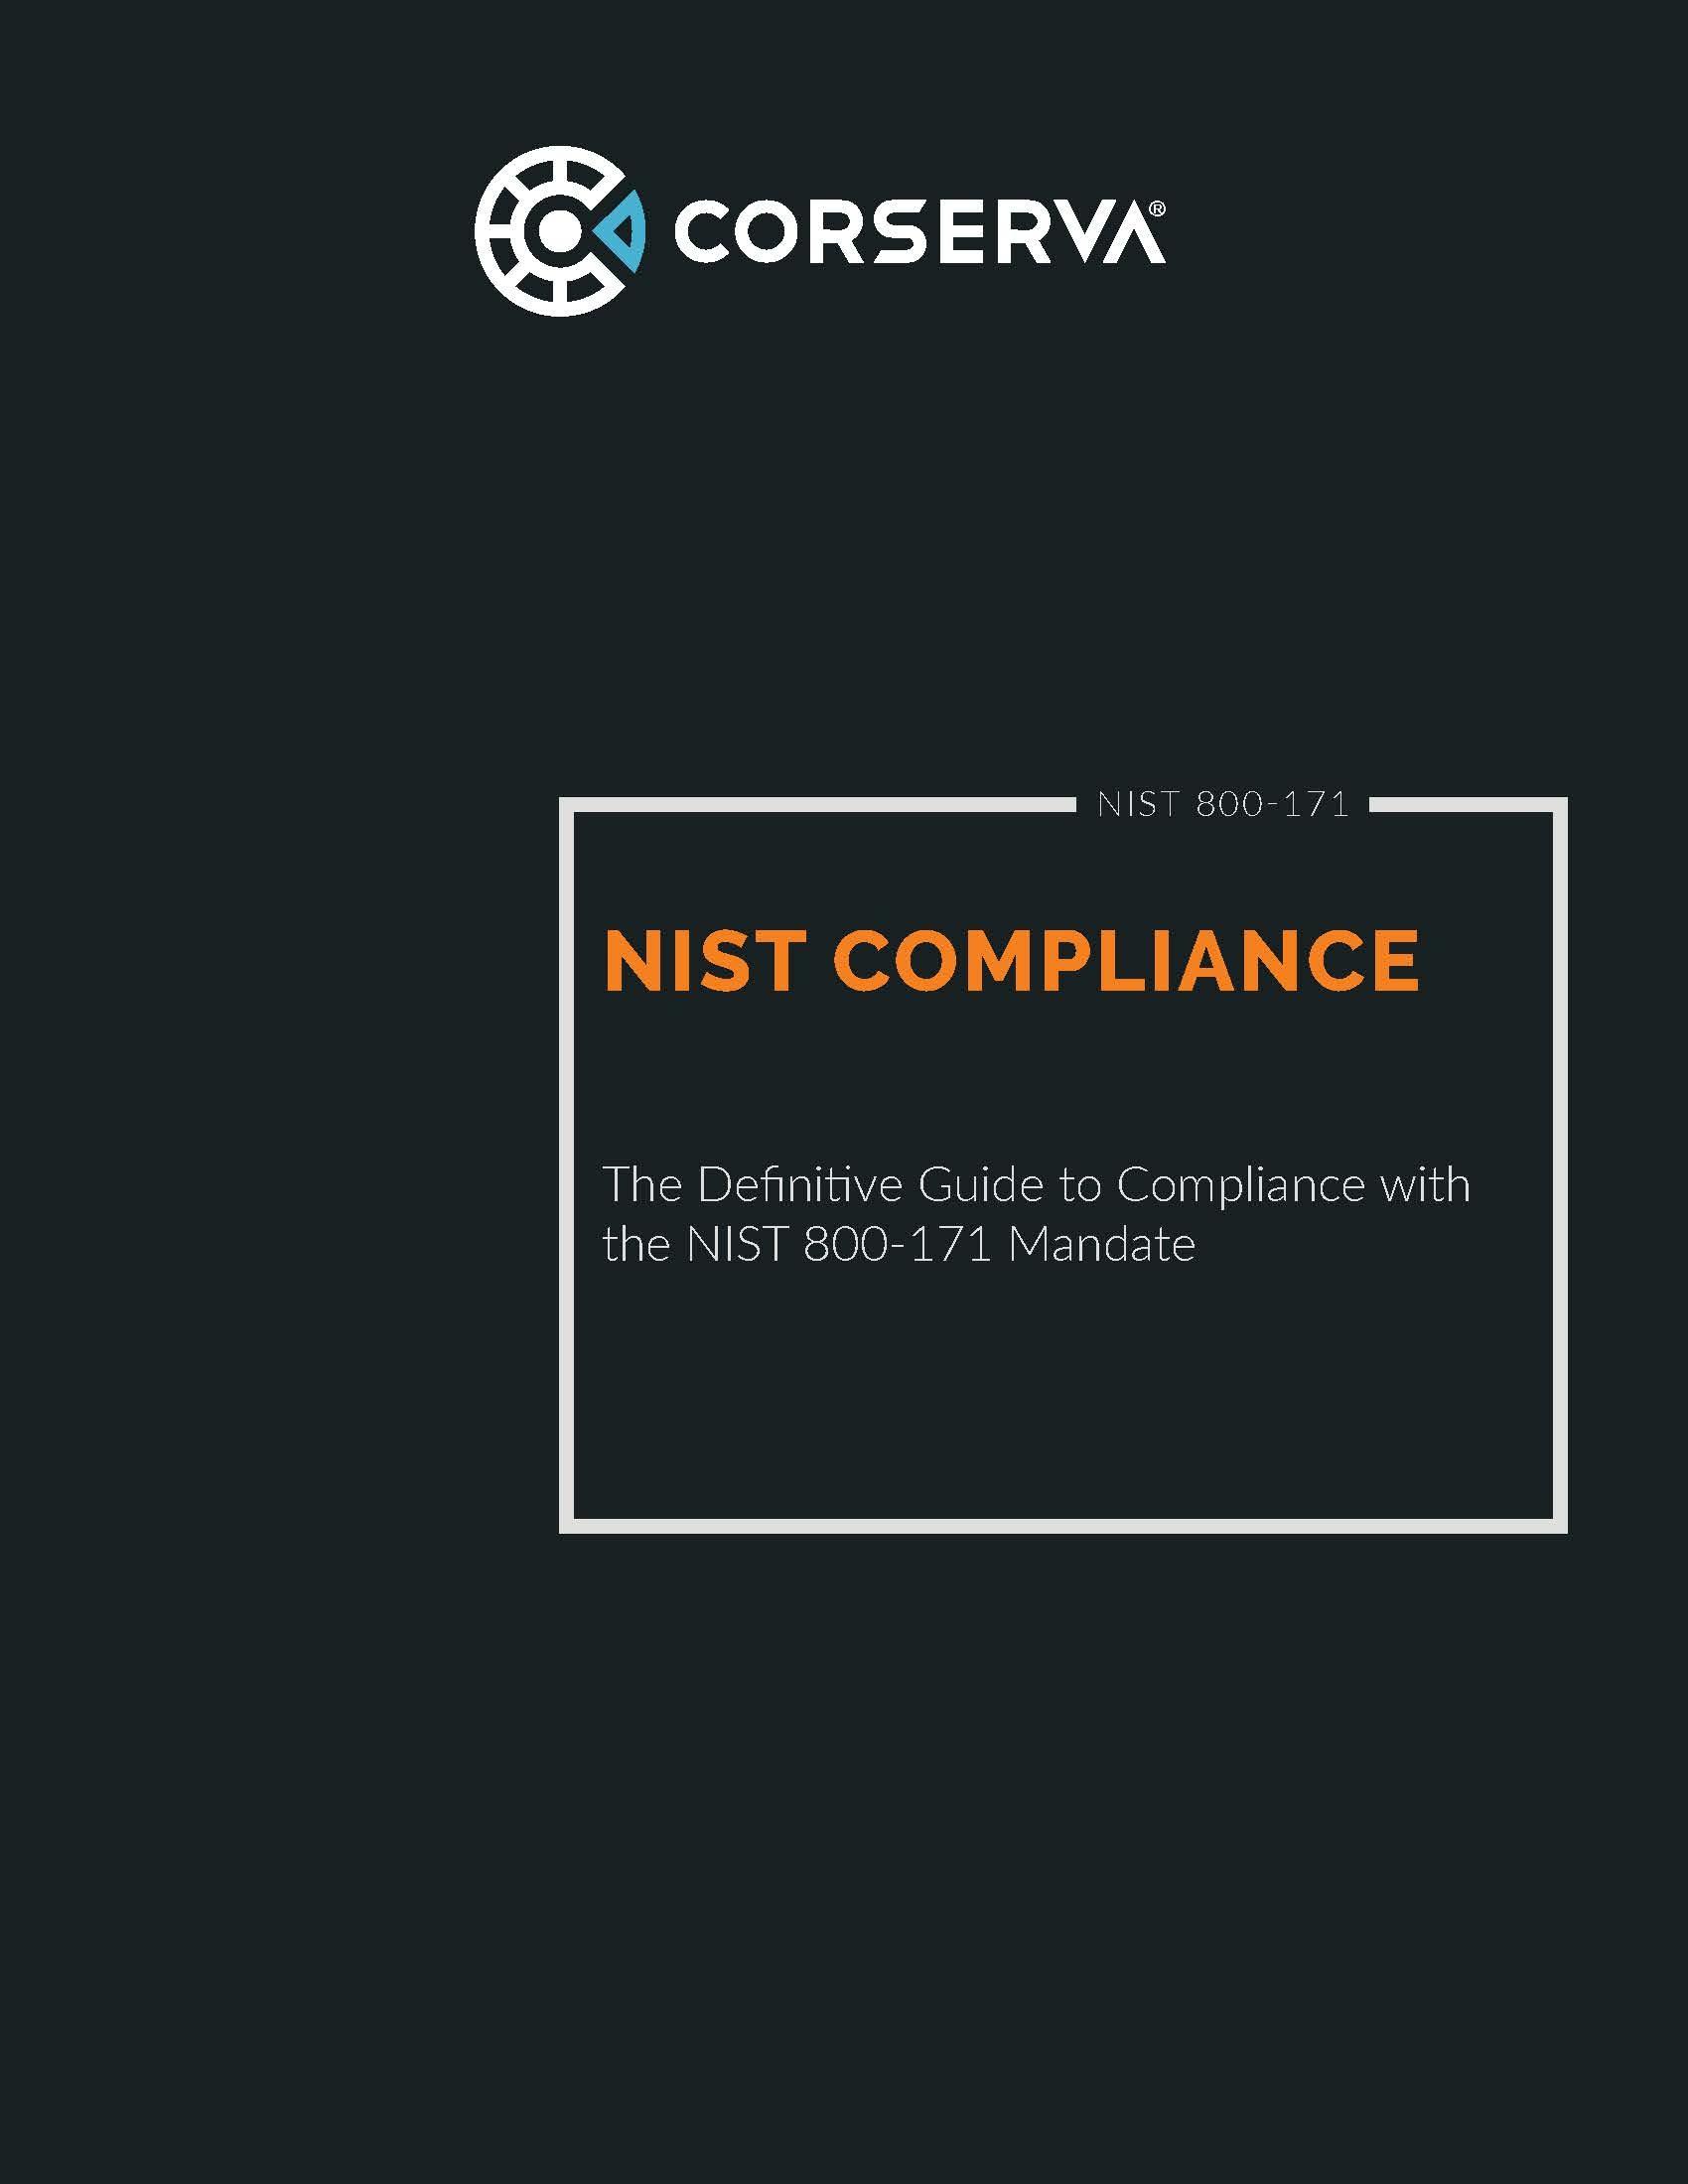 NIST compliance